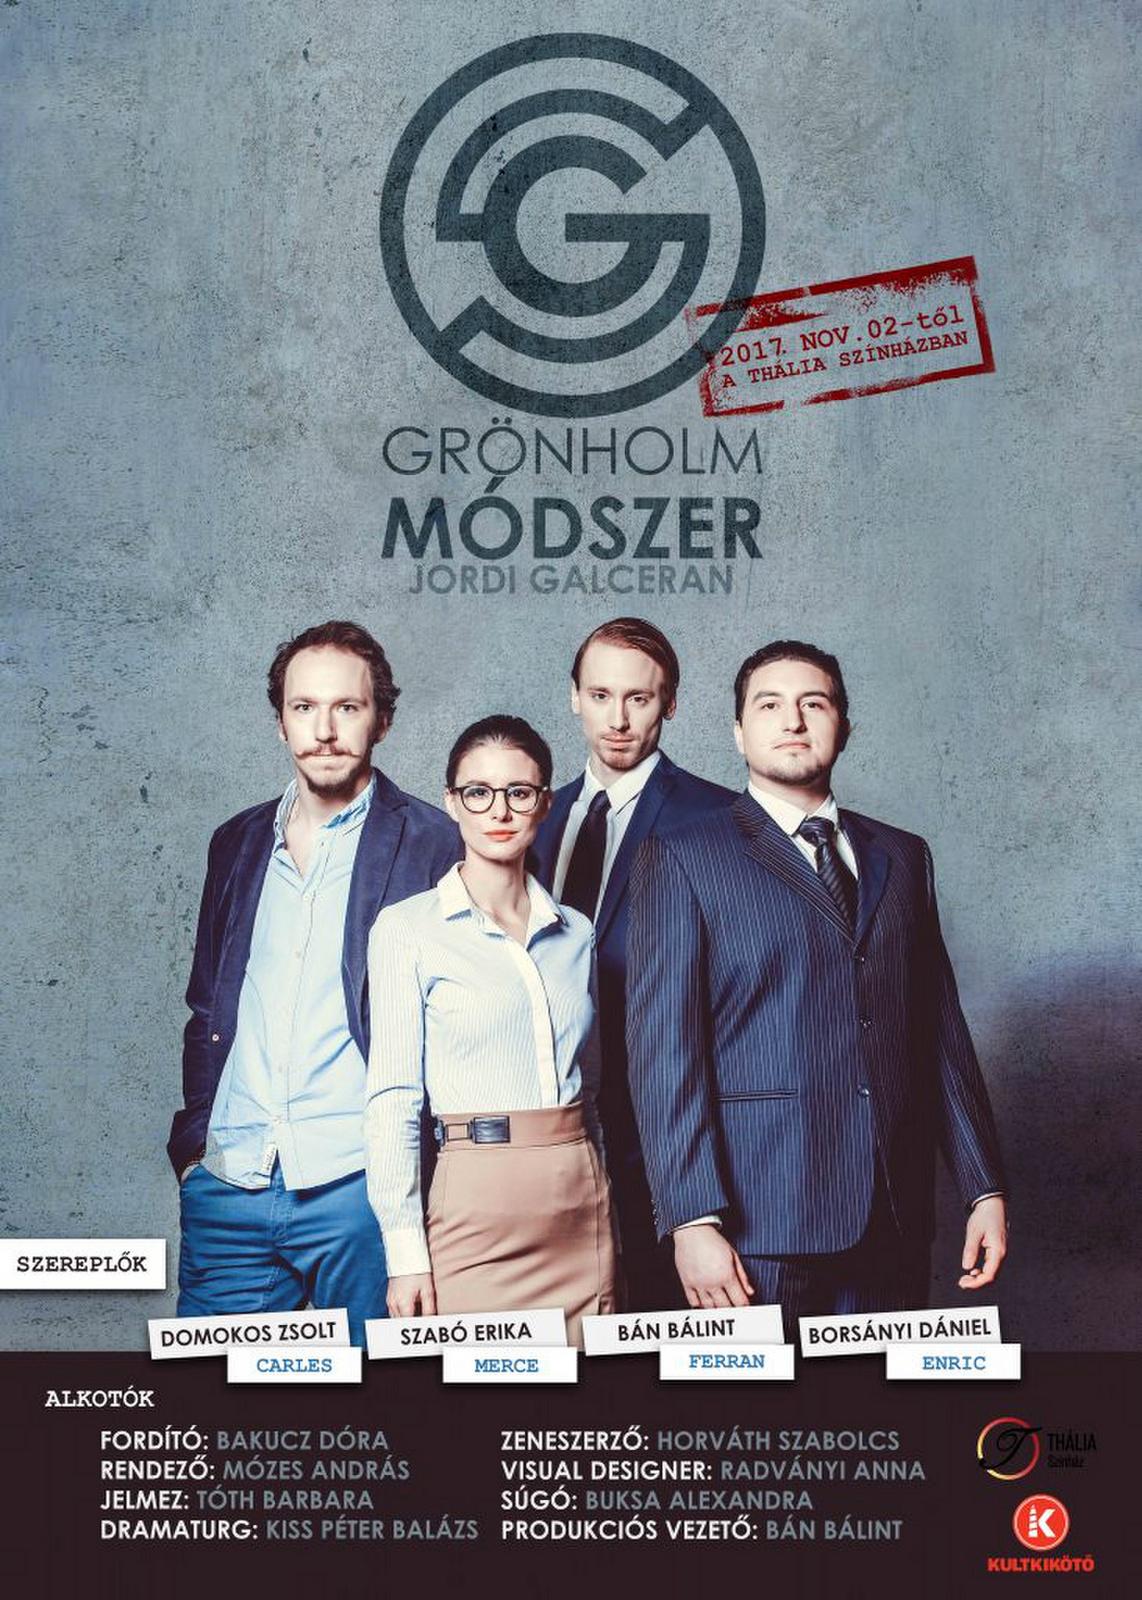 gronholm-modszer-731x1024